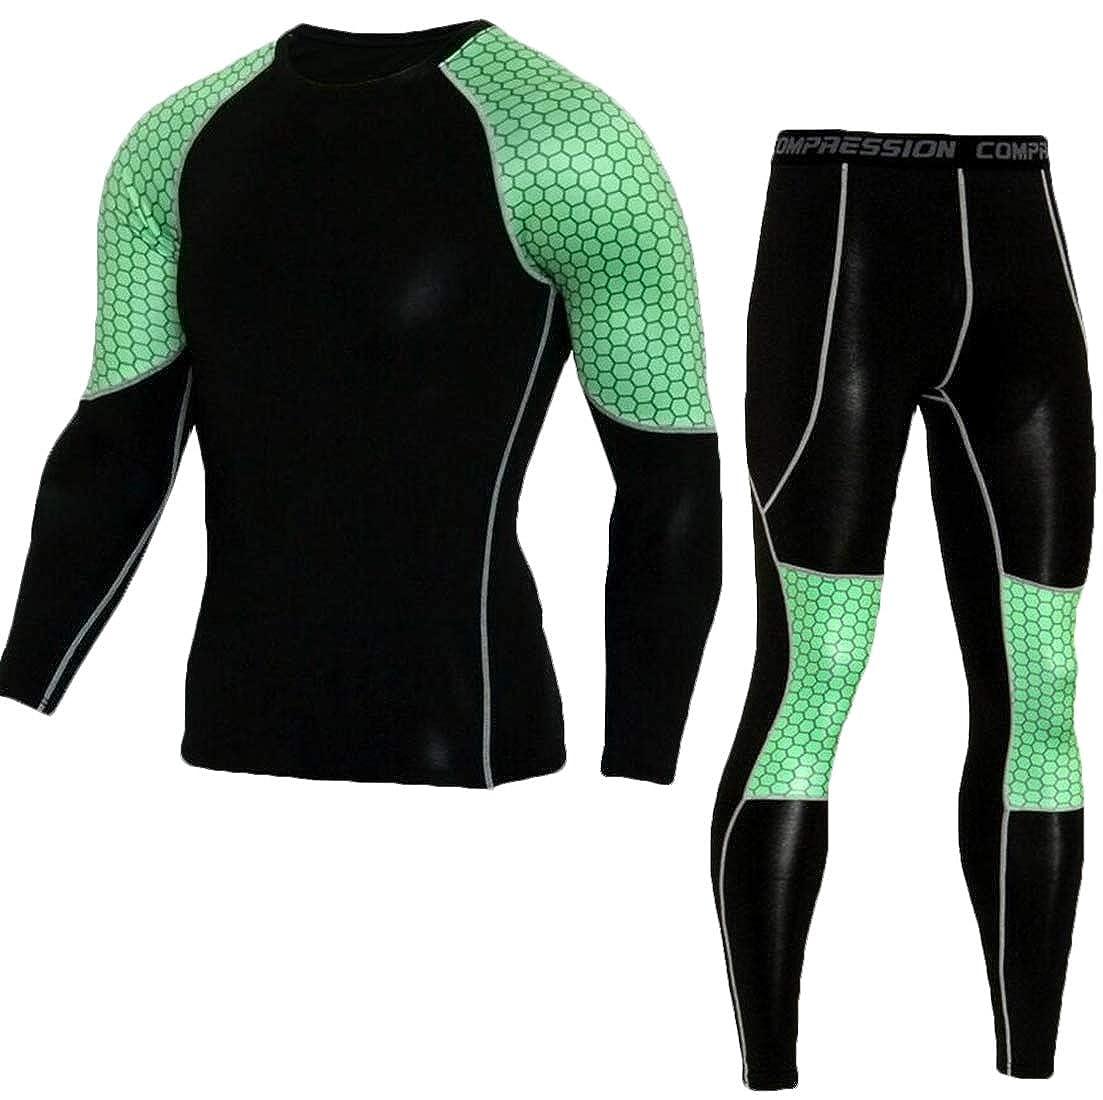 heymoney Men Sport Suit Sports Gym Pants Shirt Running Yoga Athletic Jogger Sweatpants Tops